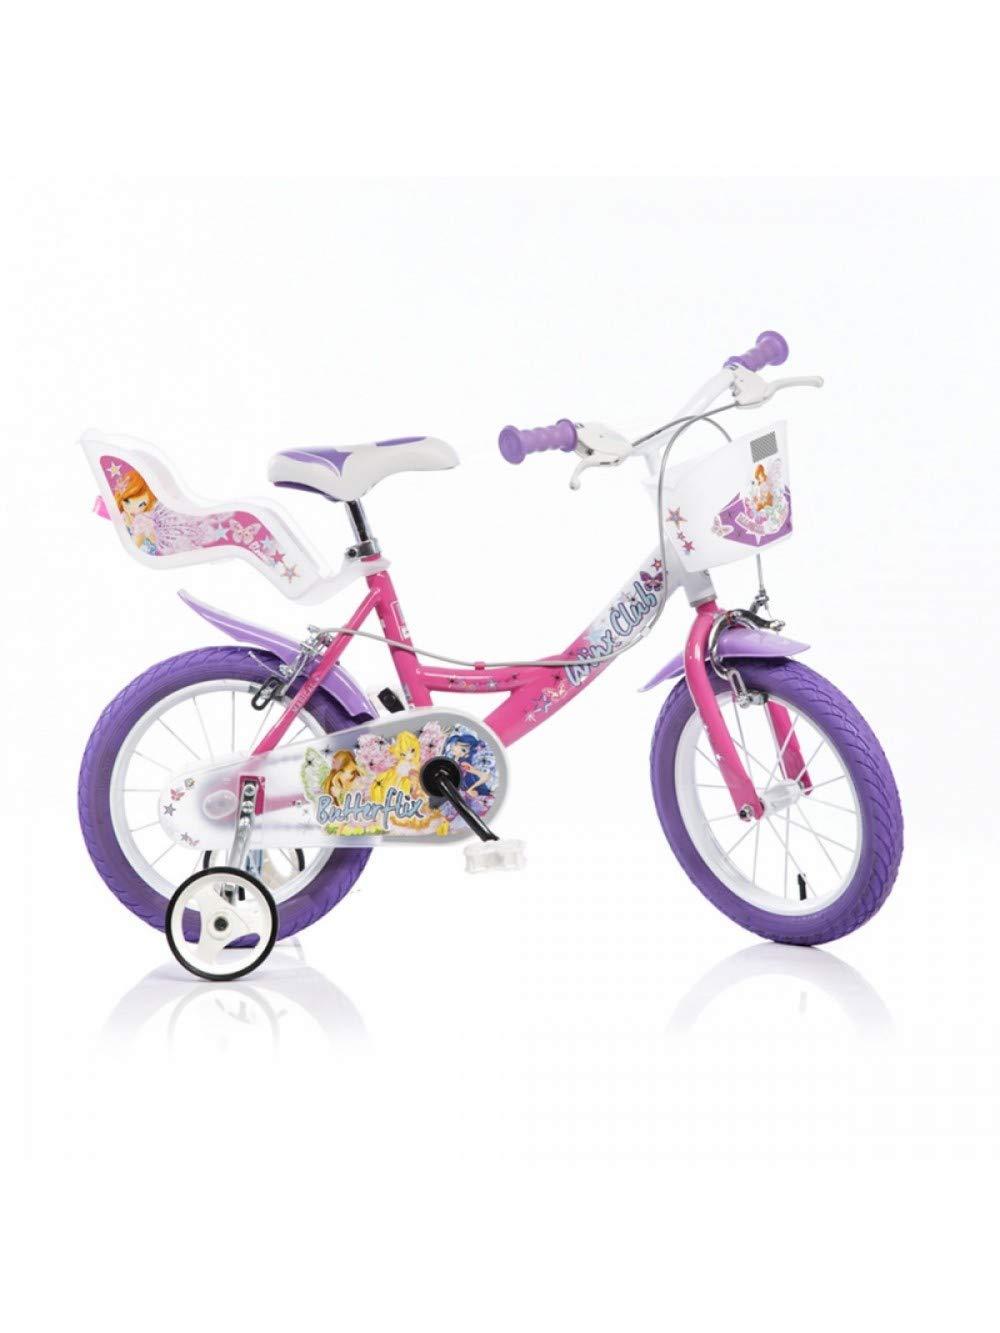 Dino Bikes 144 r-wx7 Fahrrad Mädchen – Winx, 14